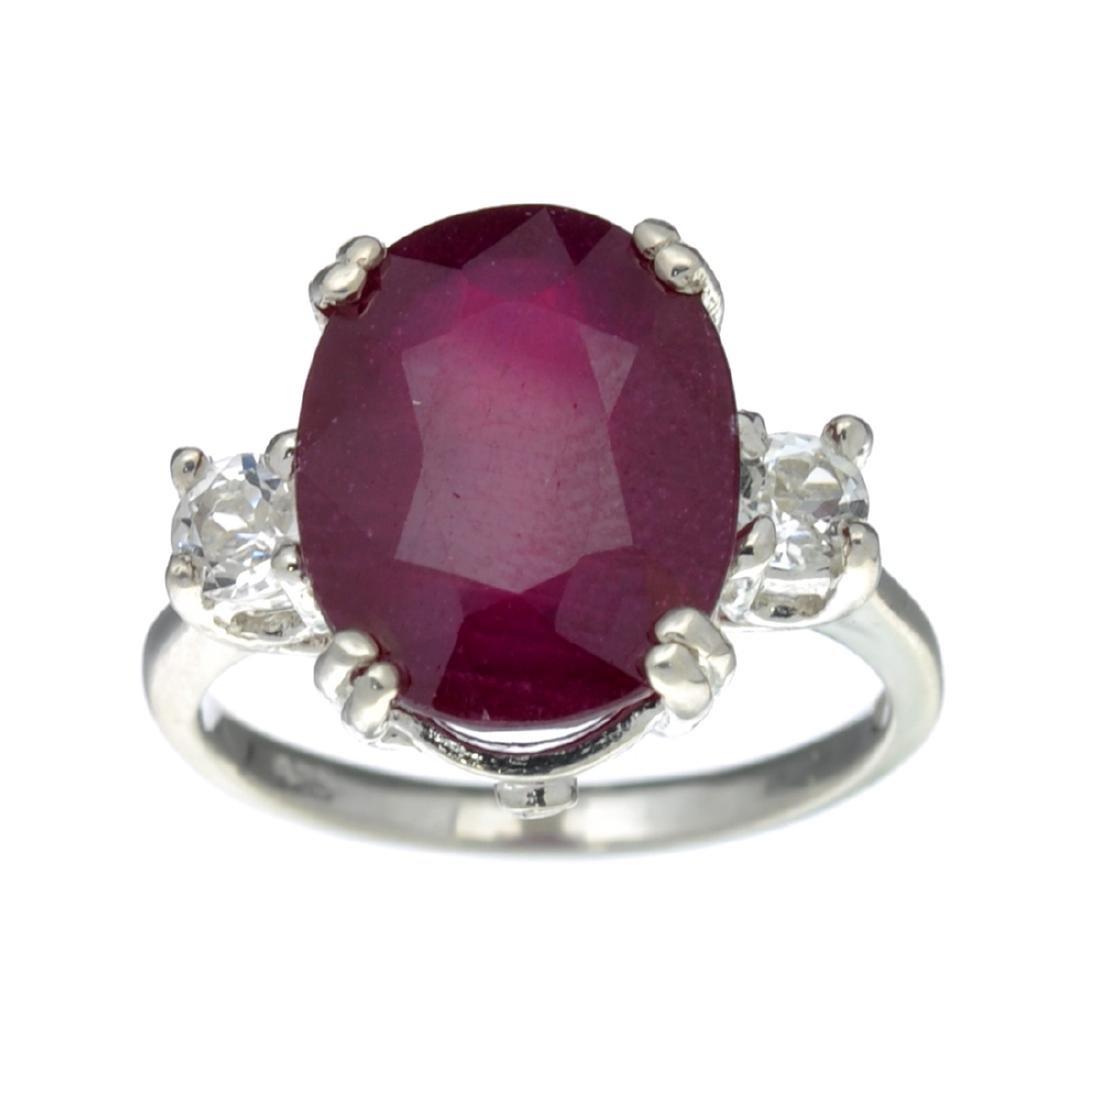 APP: 1.5k Fine Jewelry Designer Sebastian, 8.46CT Ruby